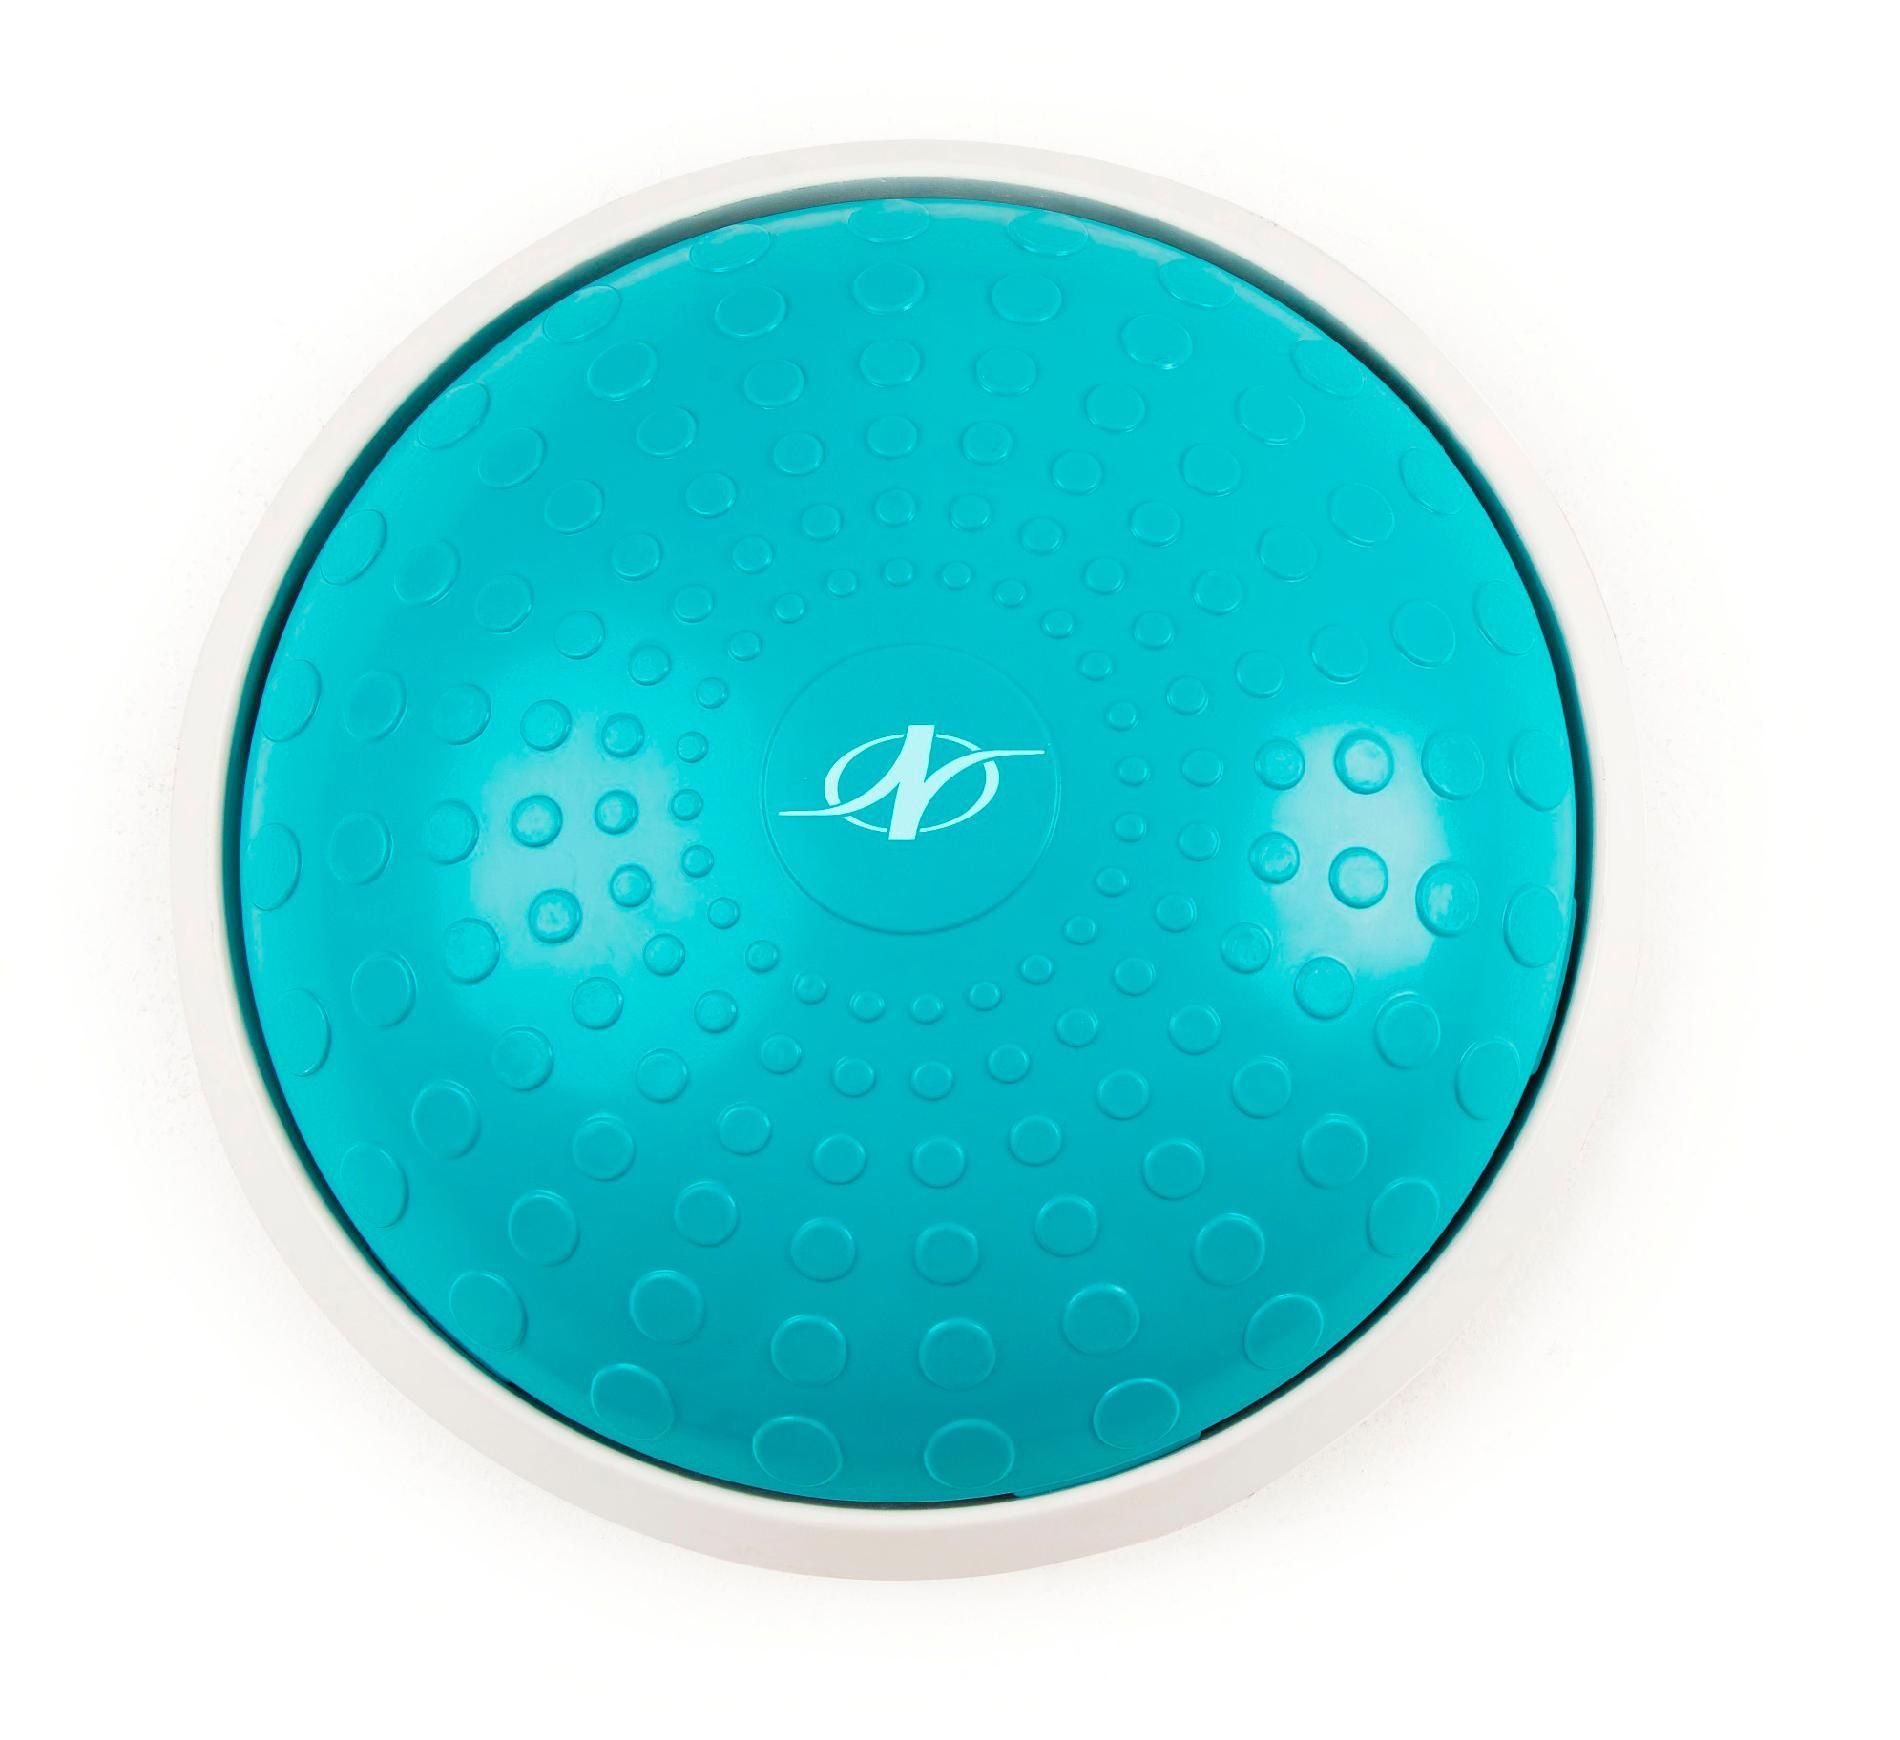 NordicTrack Training balance ball